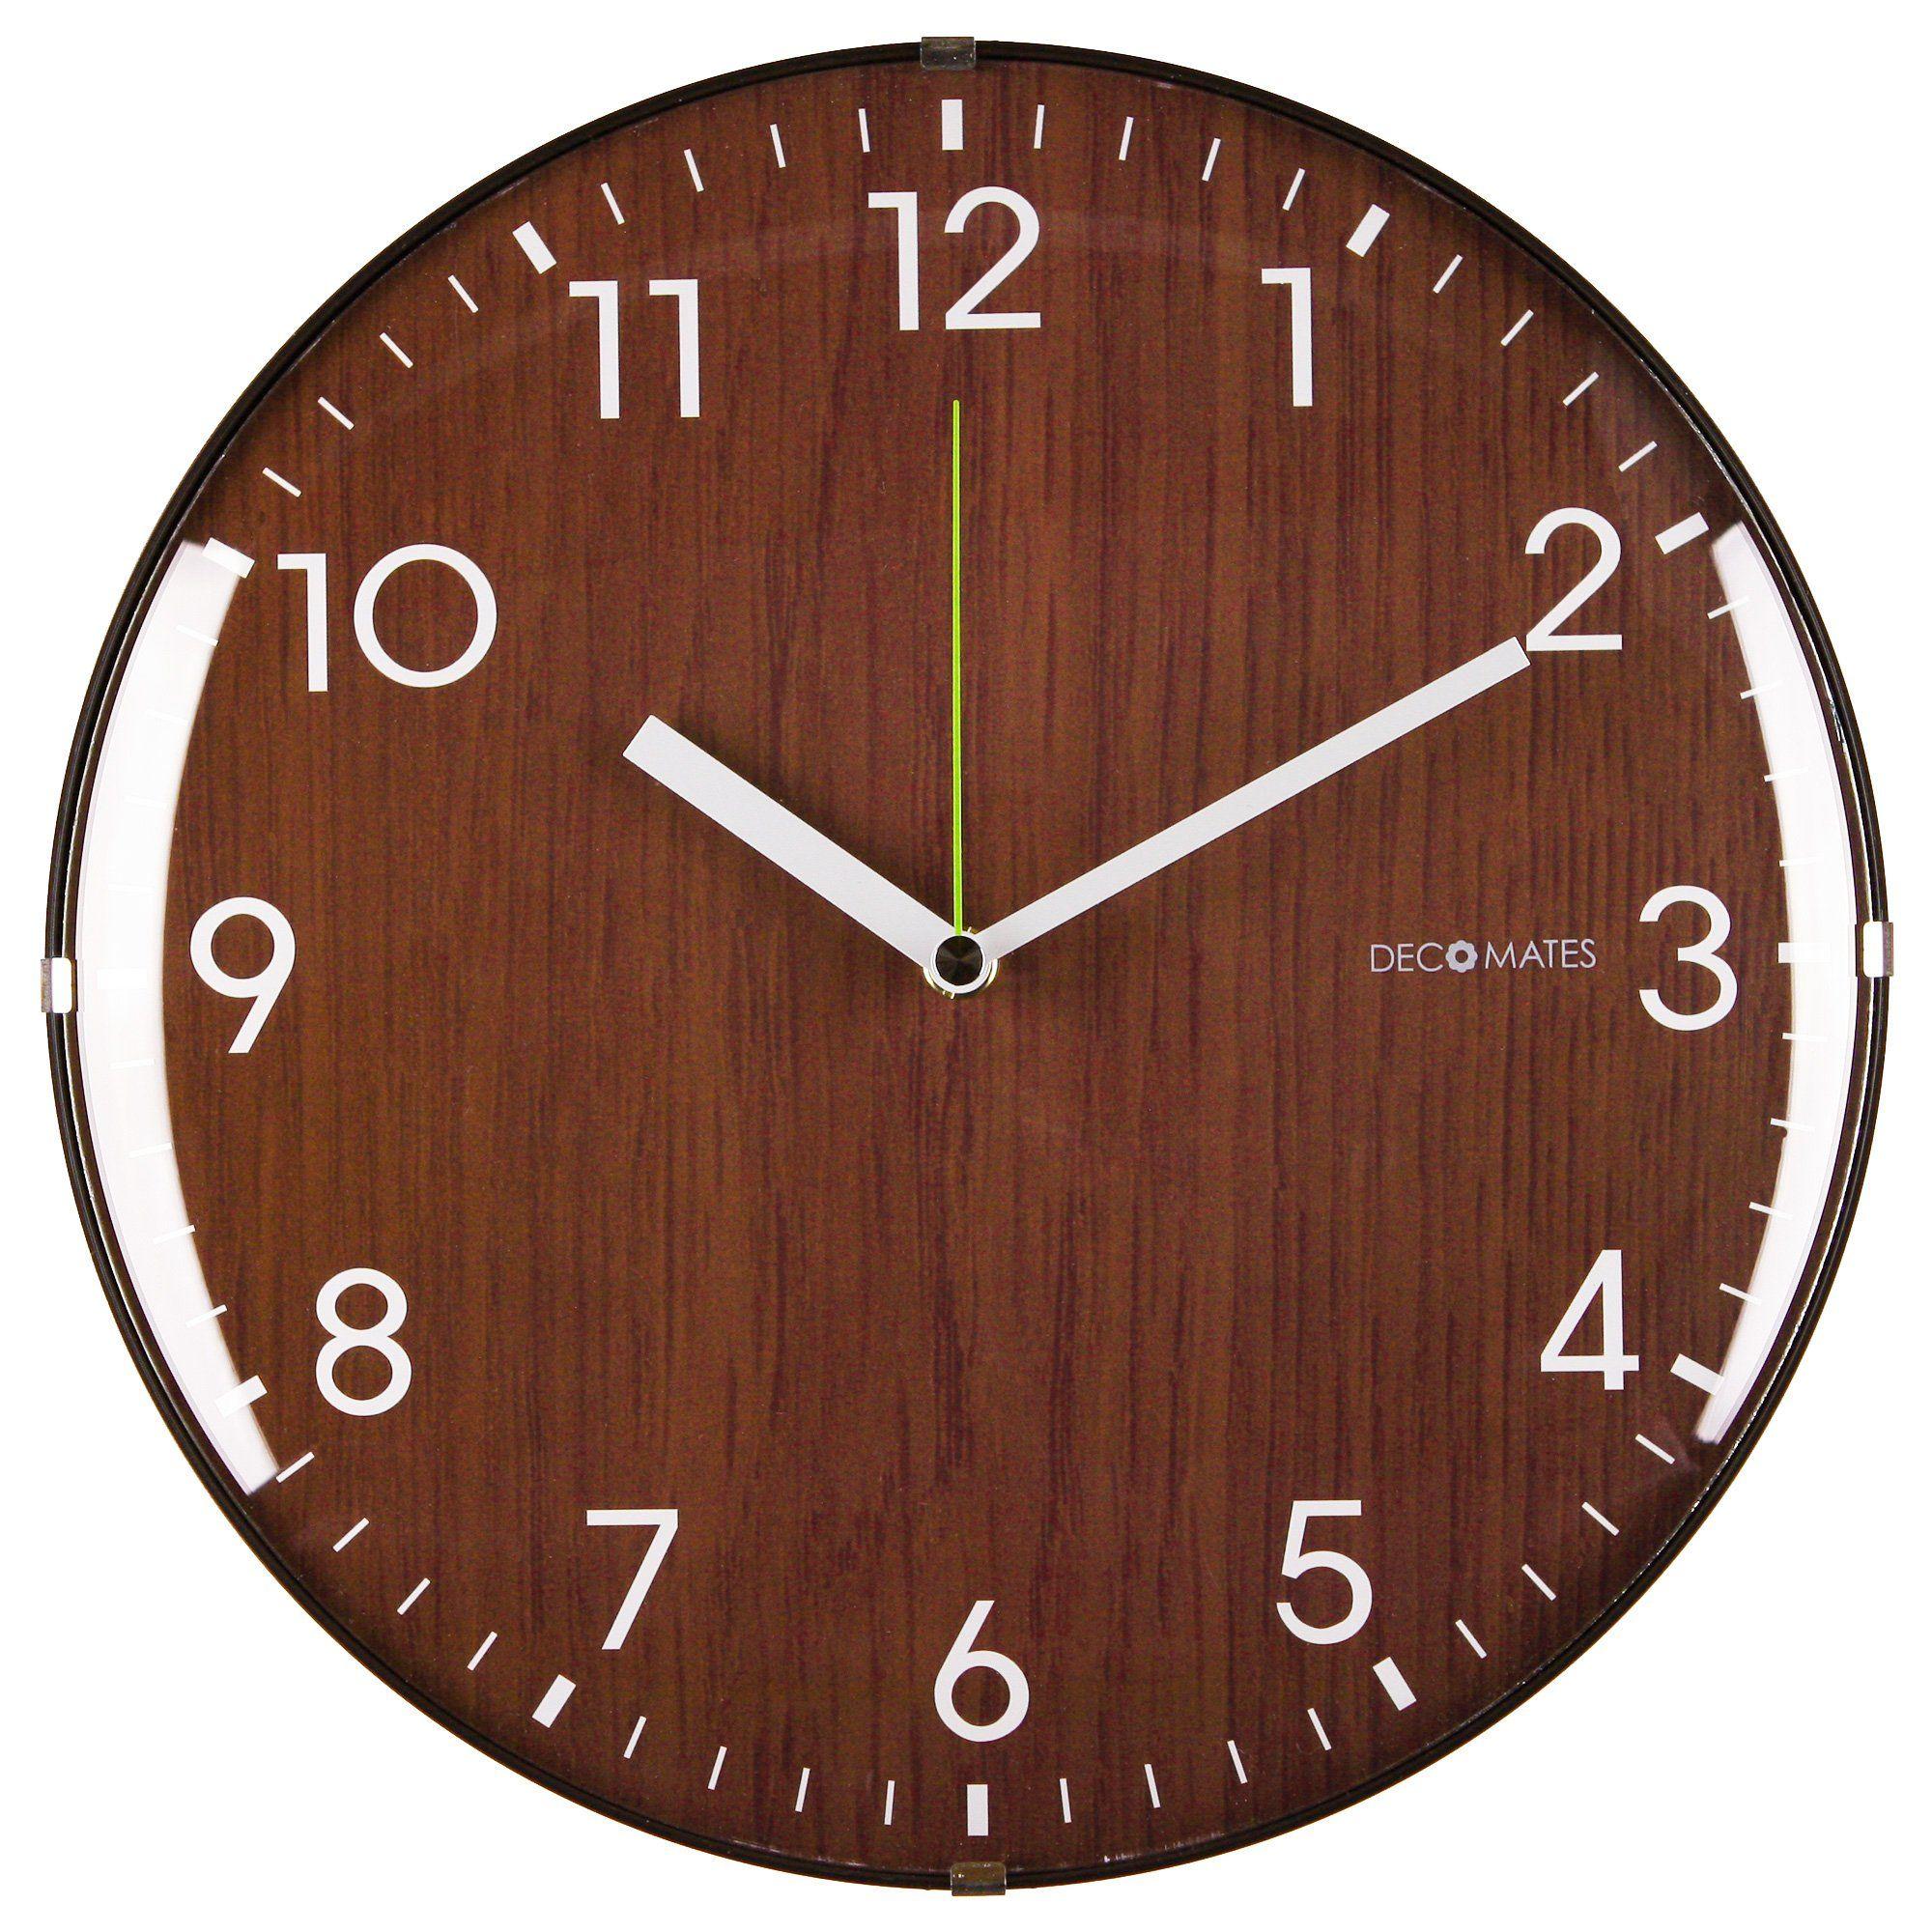 Amazon decomates non ticking silent wall clock dome wooden amazon decomates non ticking silent wall clock dome wooden brown amipublicfo Choice Image